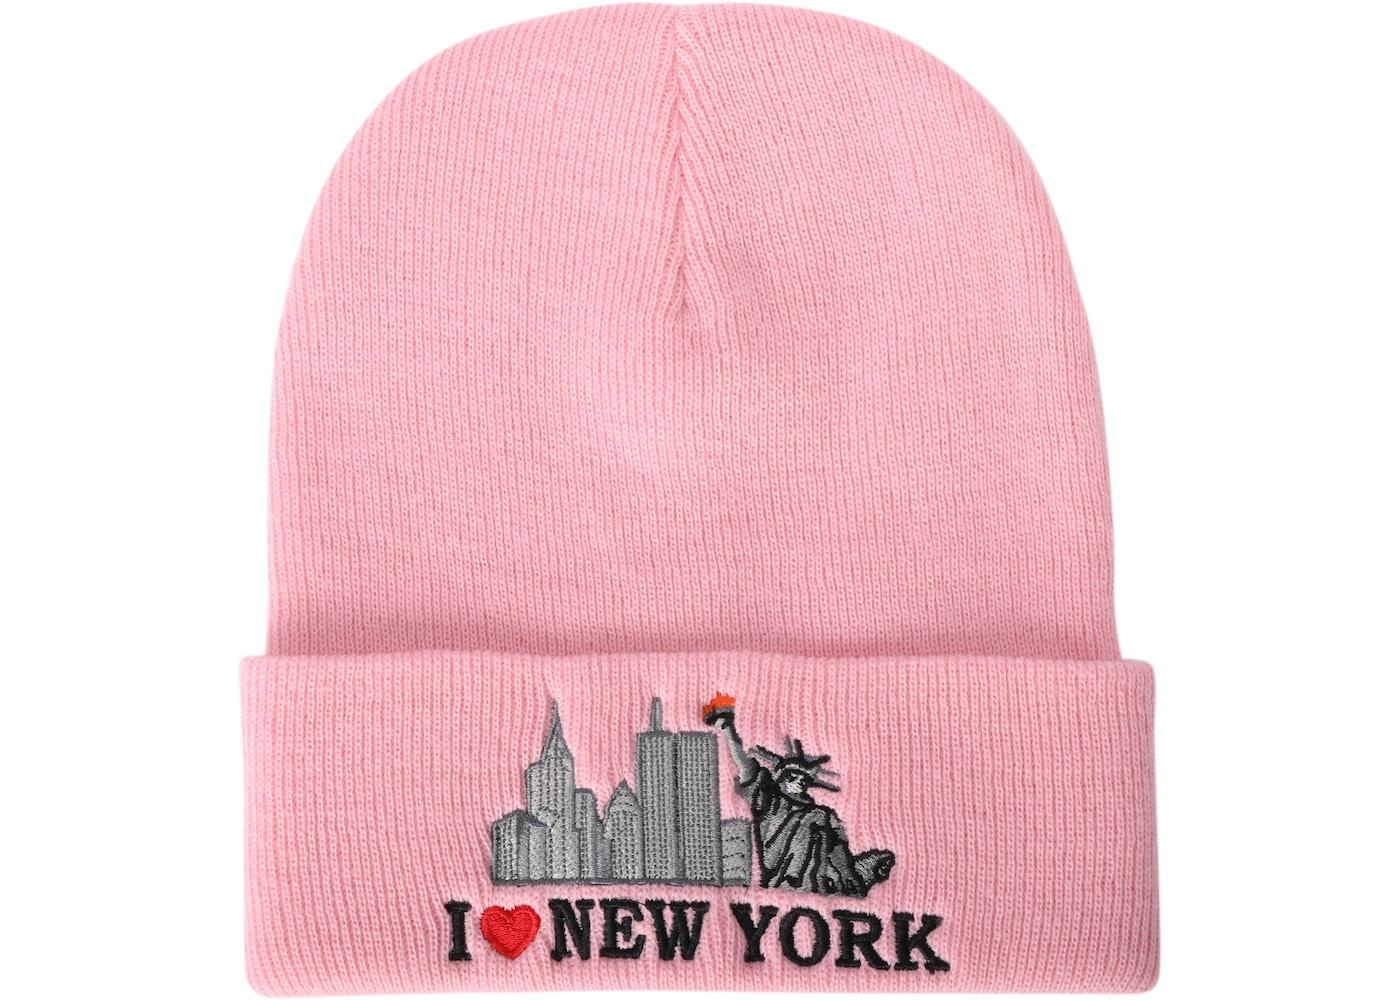 6b62af5bbb911 Supreme I Love NY Beanie Pink - FW17